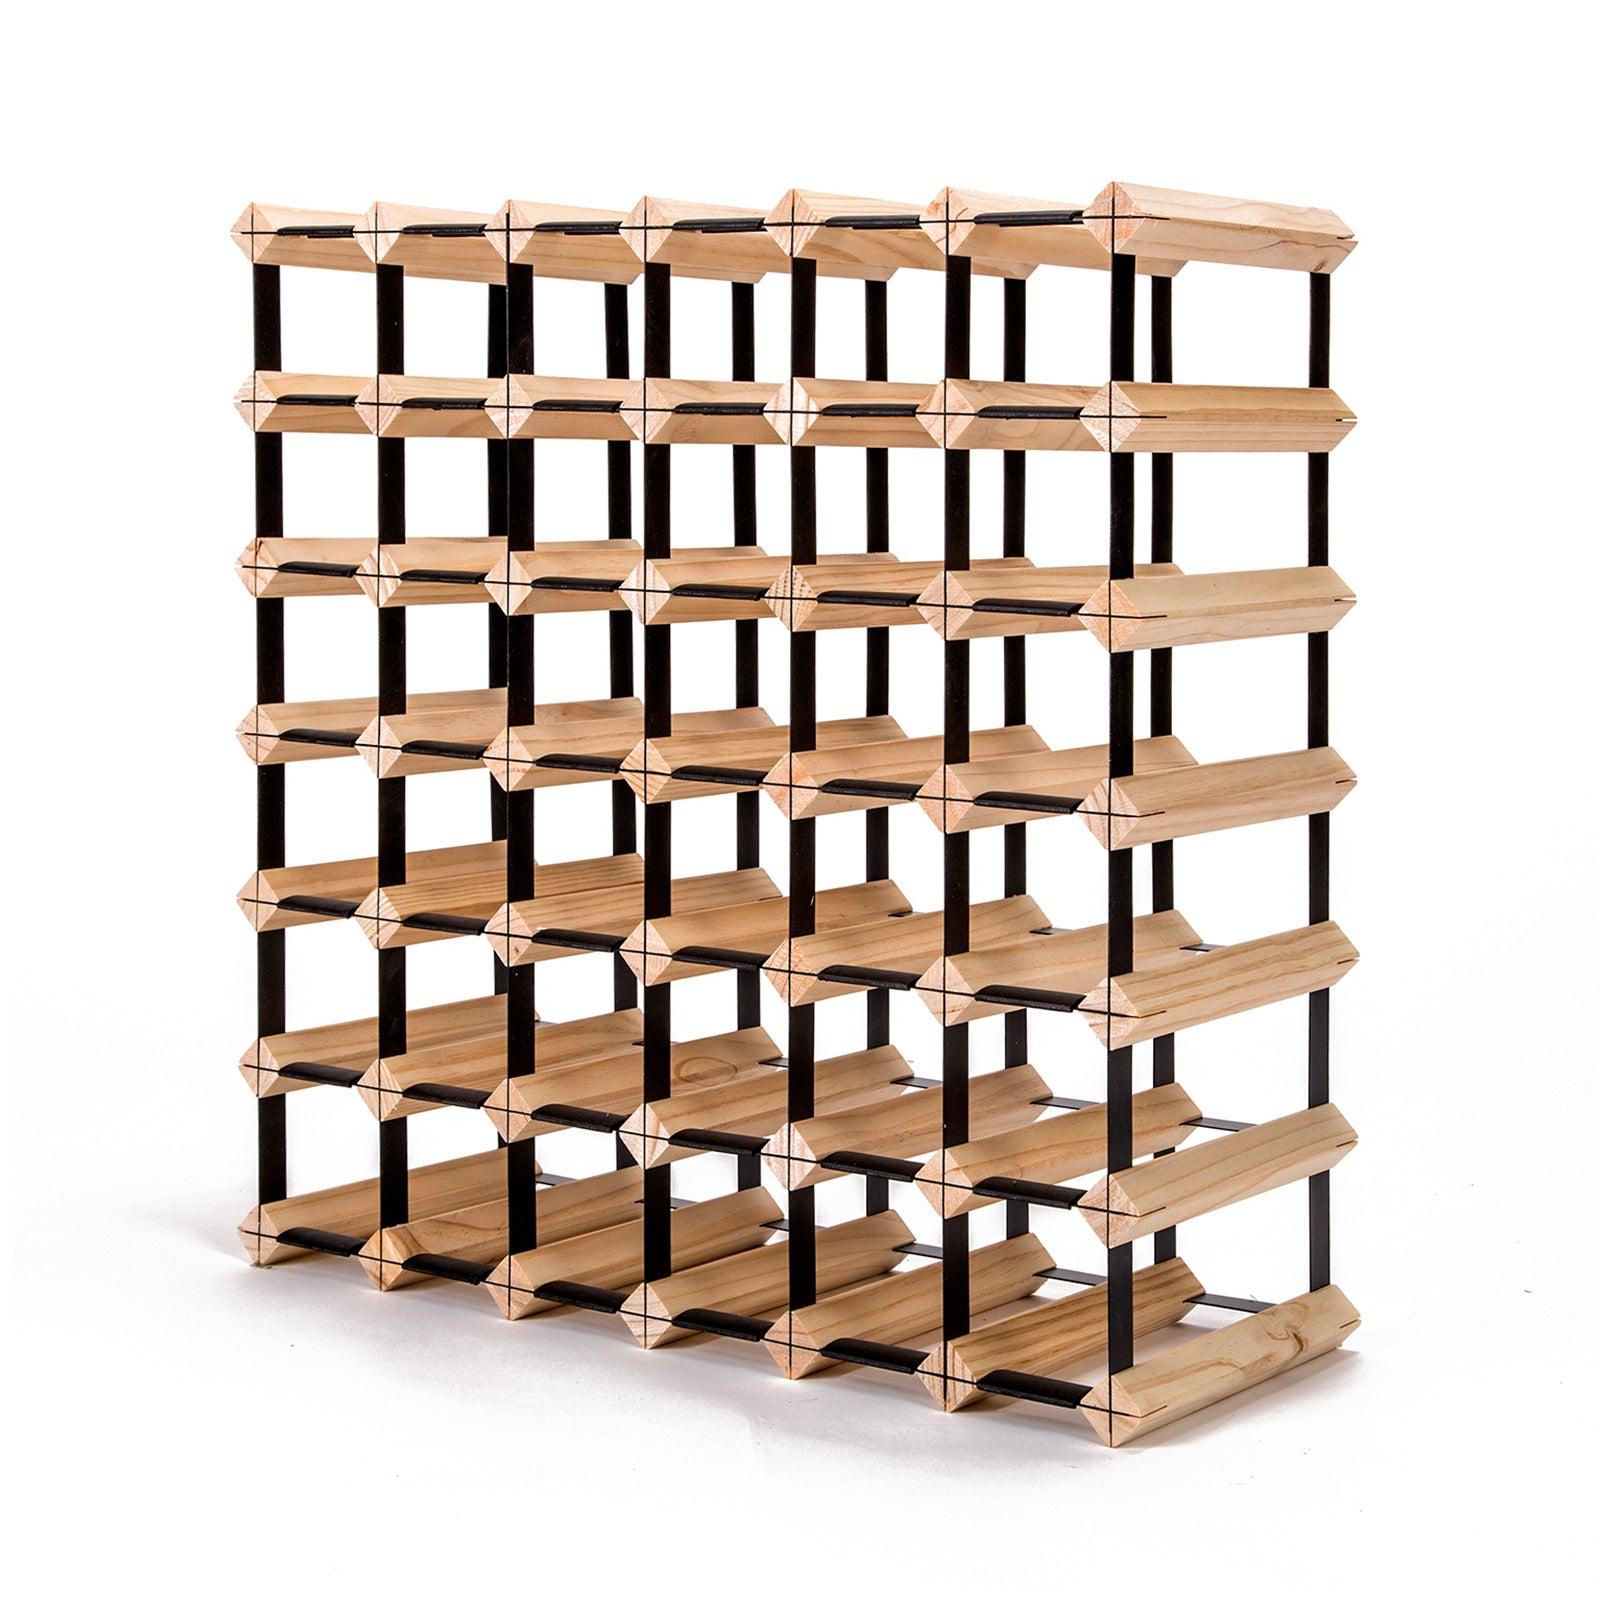 Timber Wine Rack Storage Cellar Organiser 42 Bottle